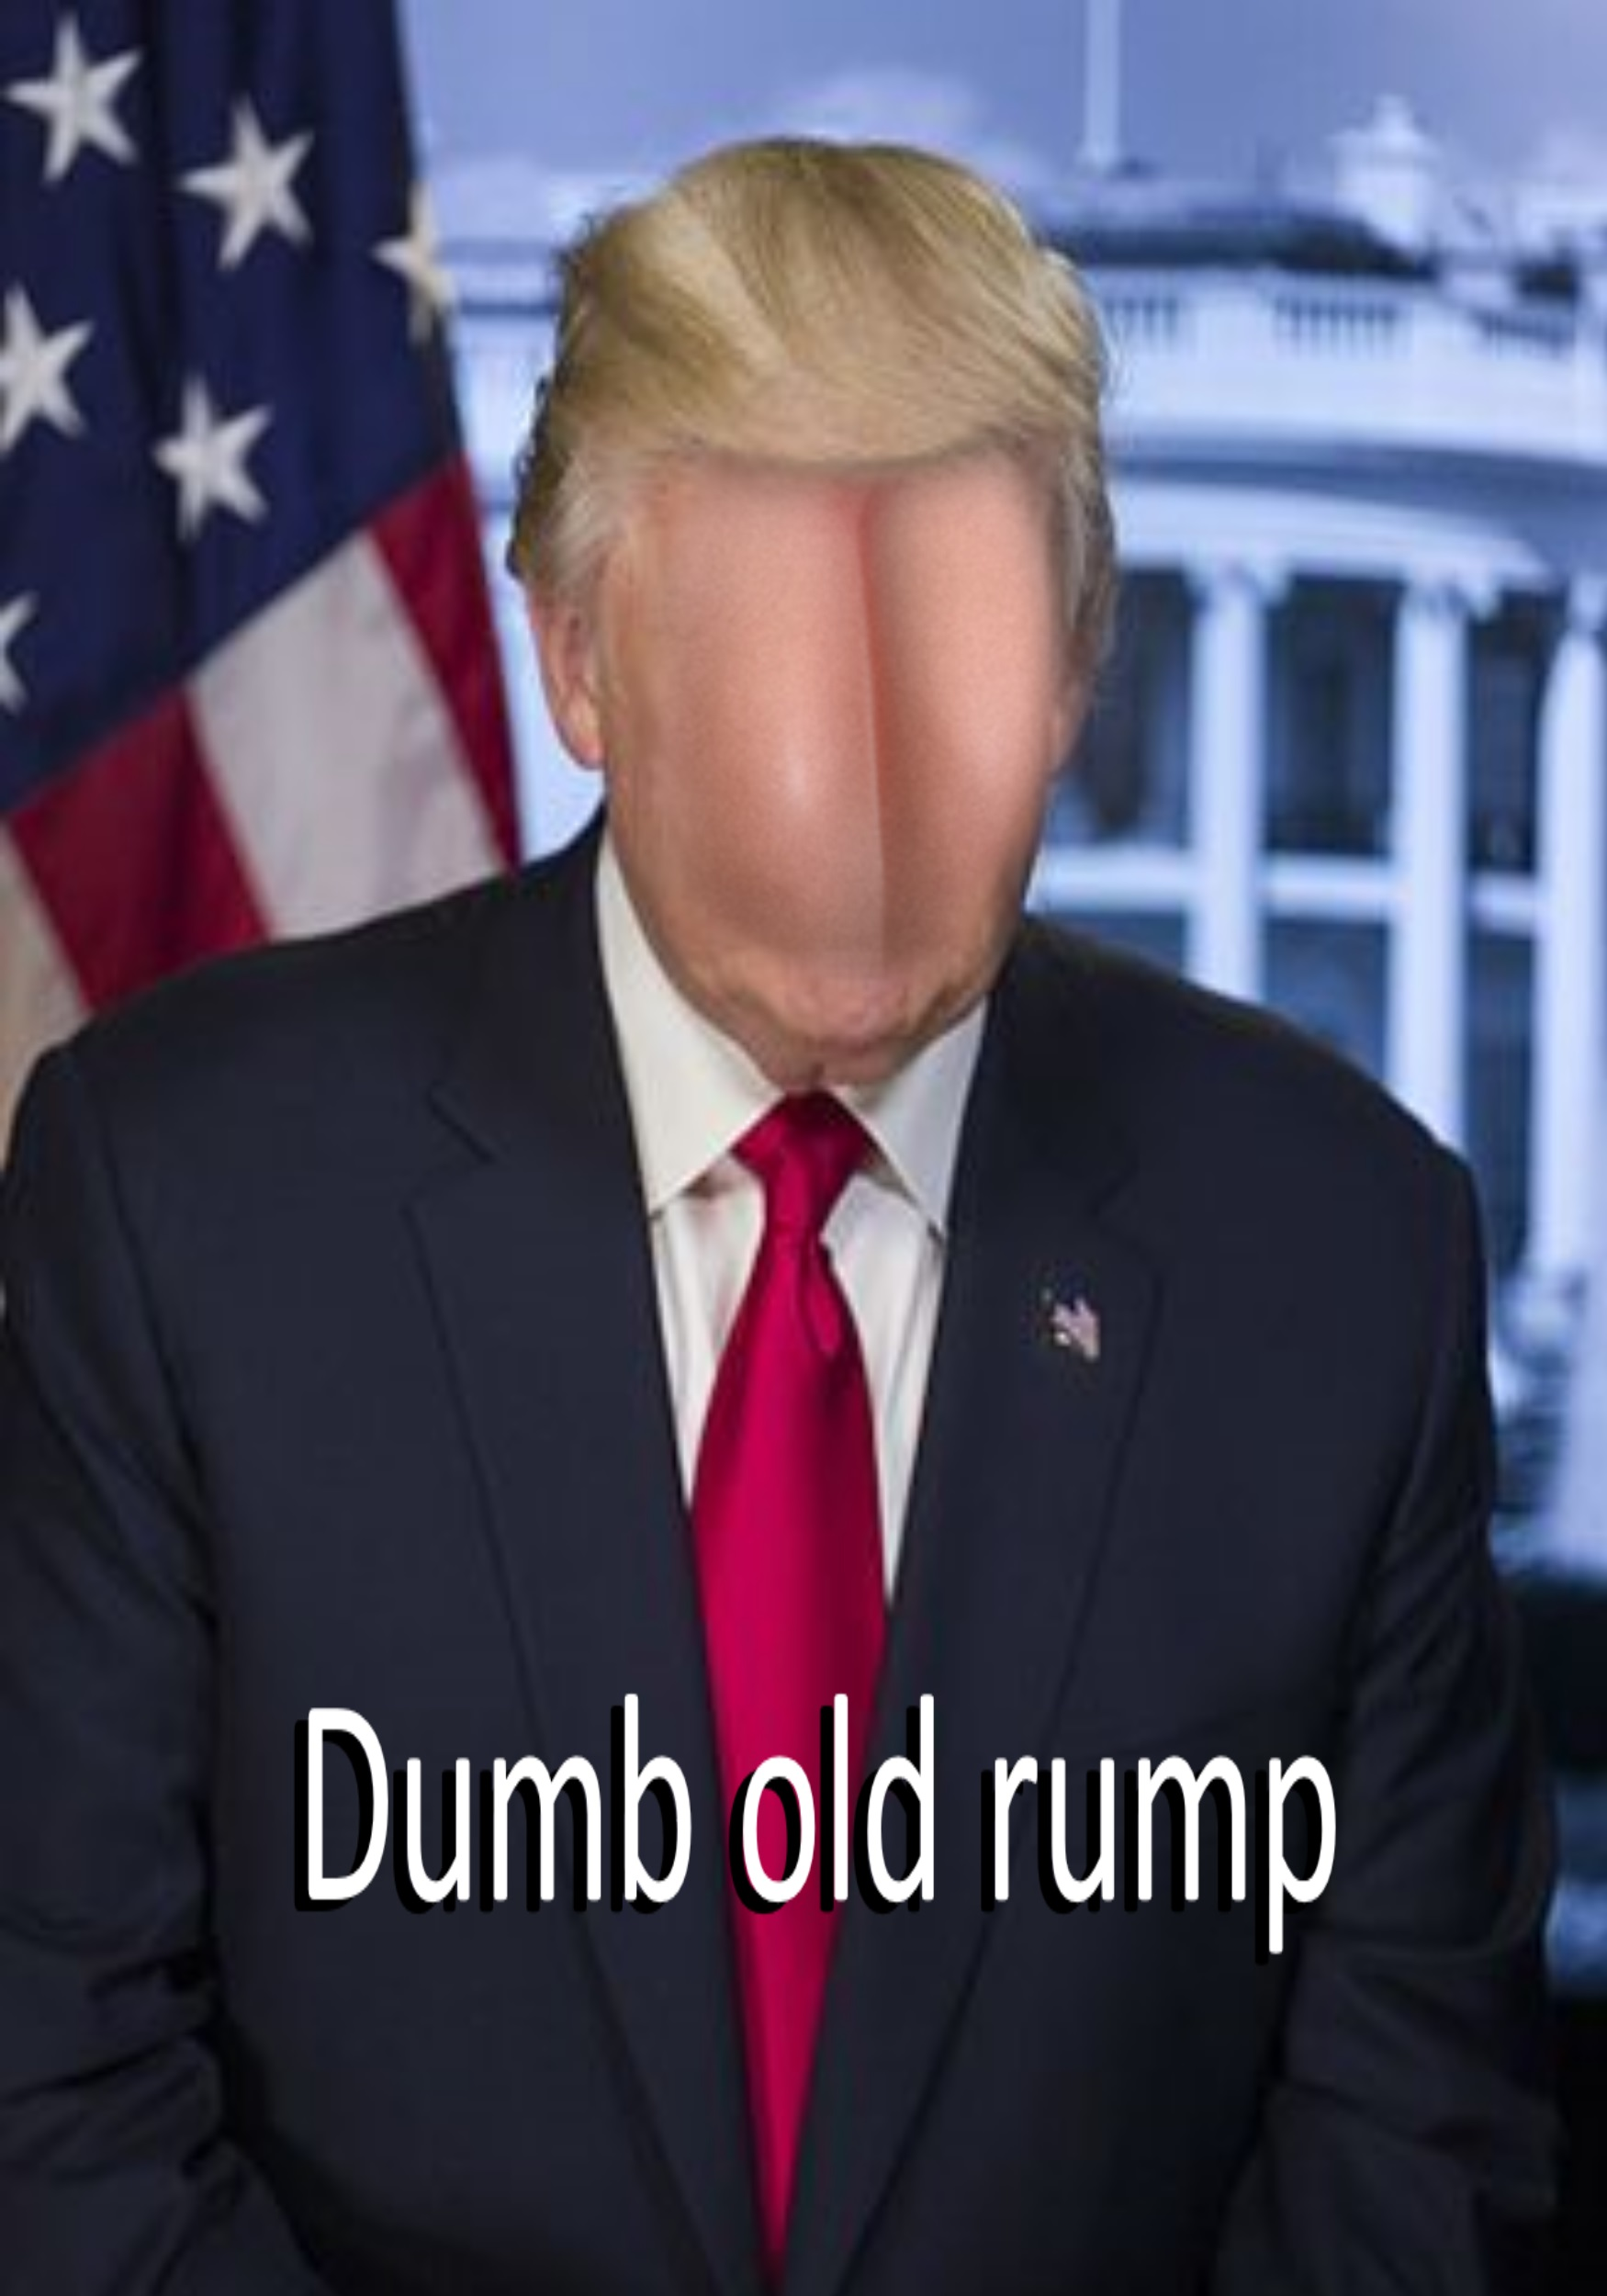 dumb rump